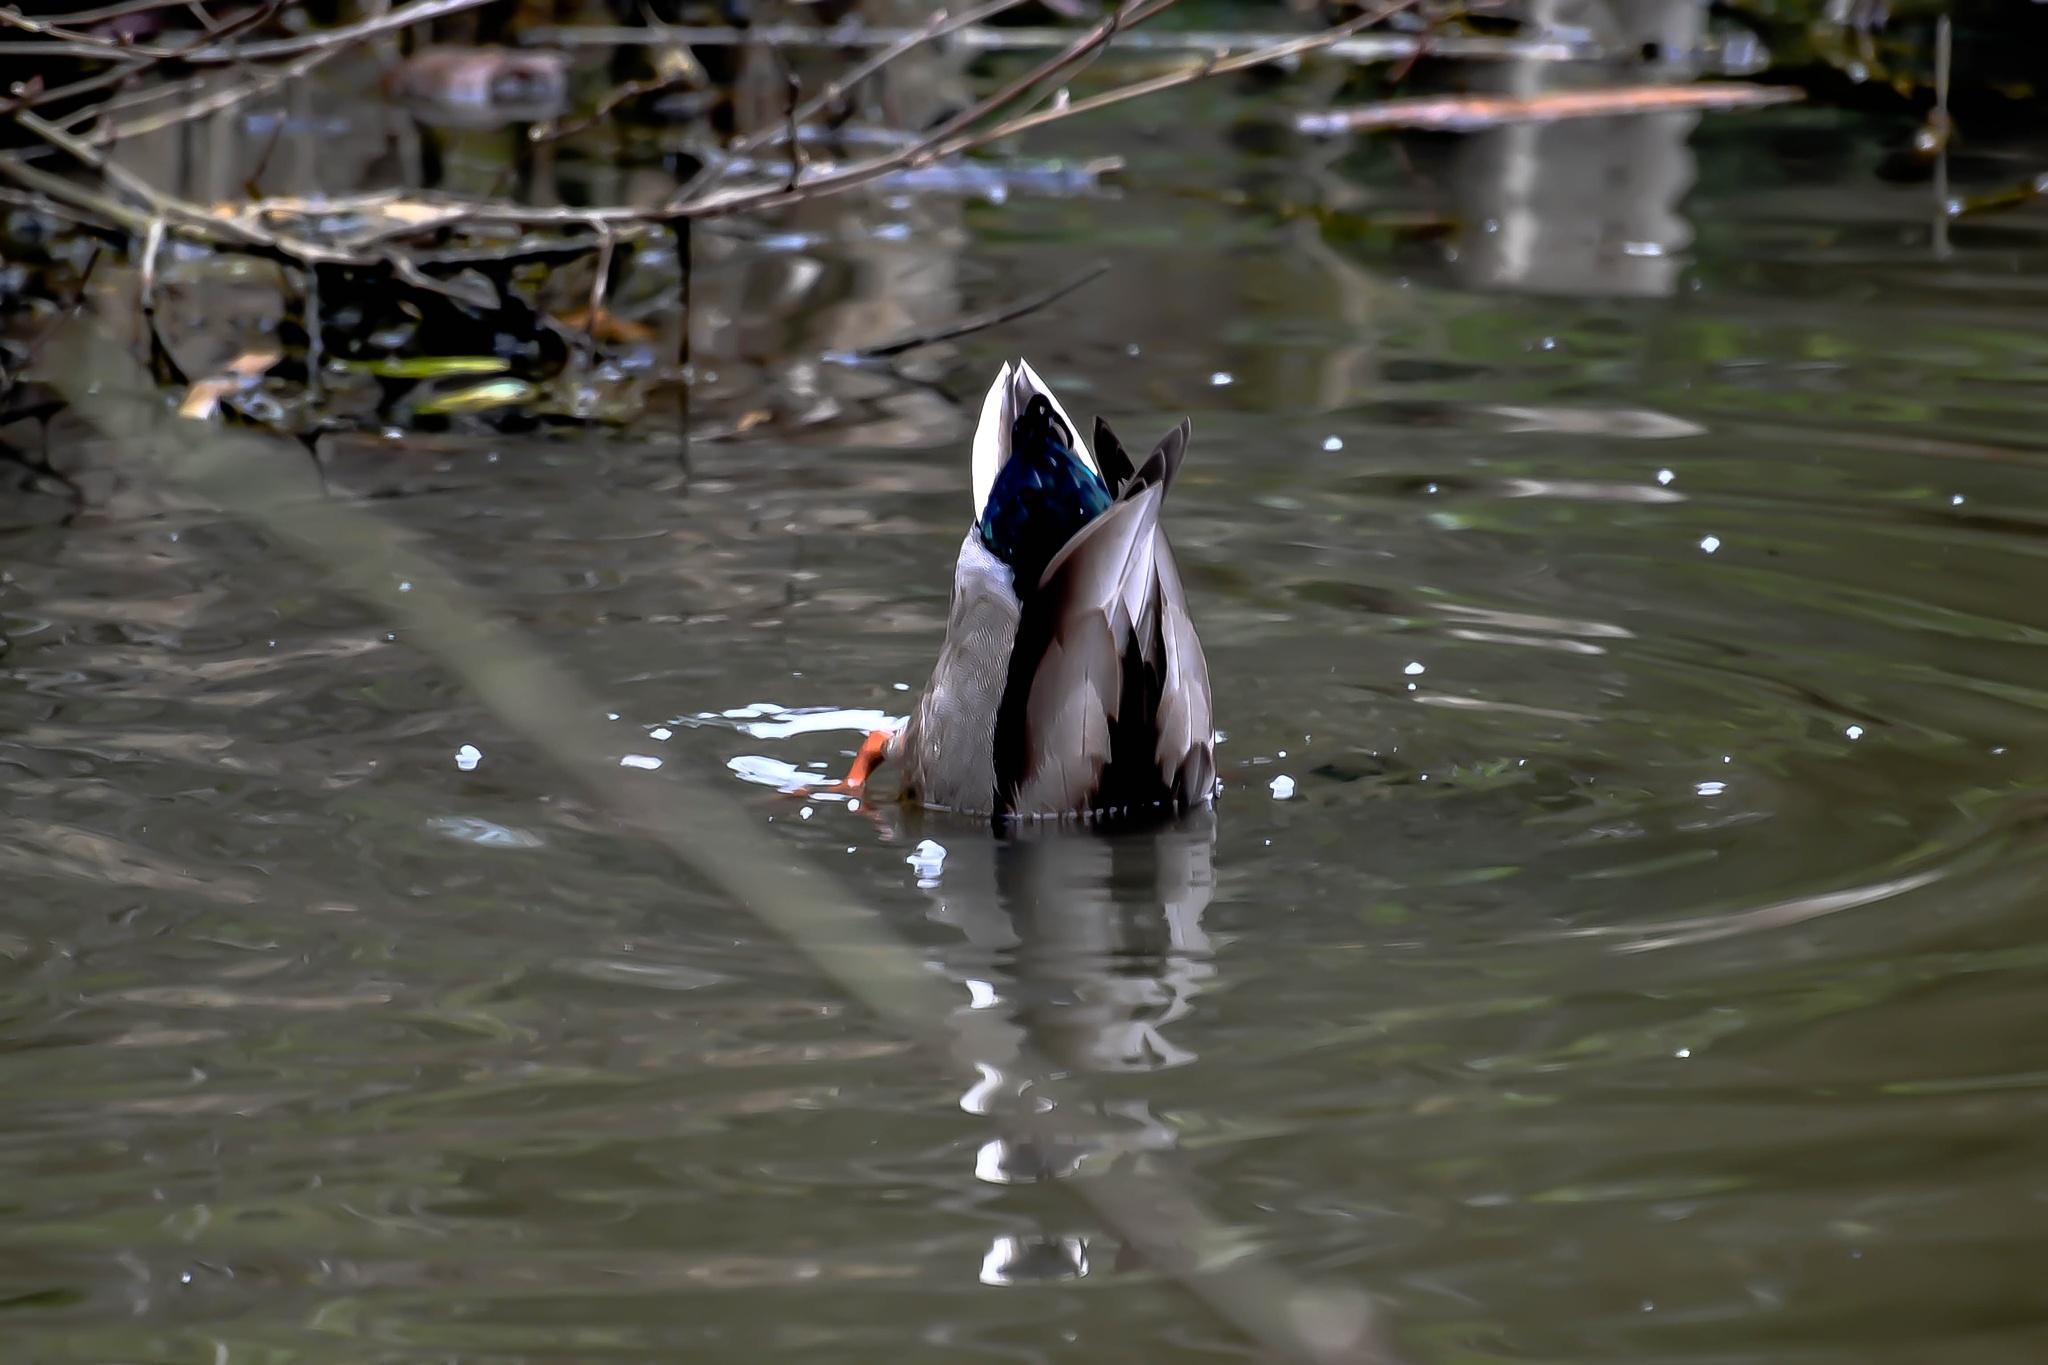 Reflextion, duck under water by ilseBodewes